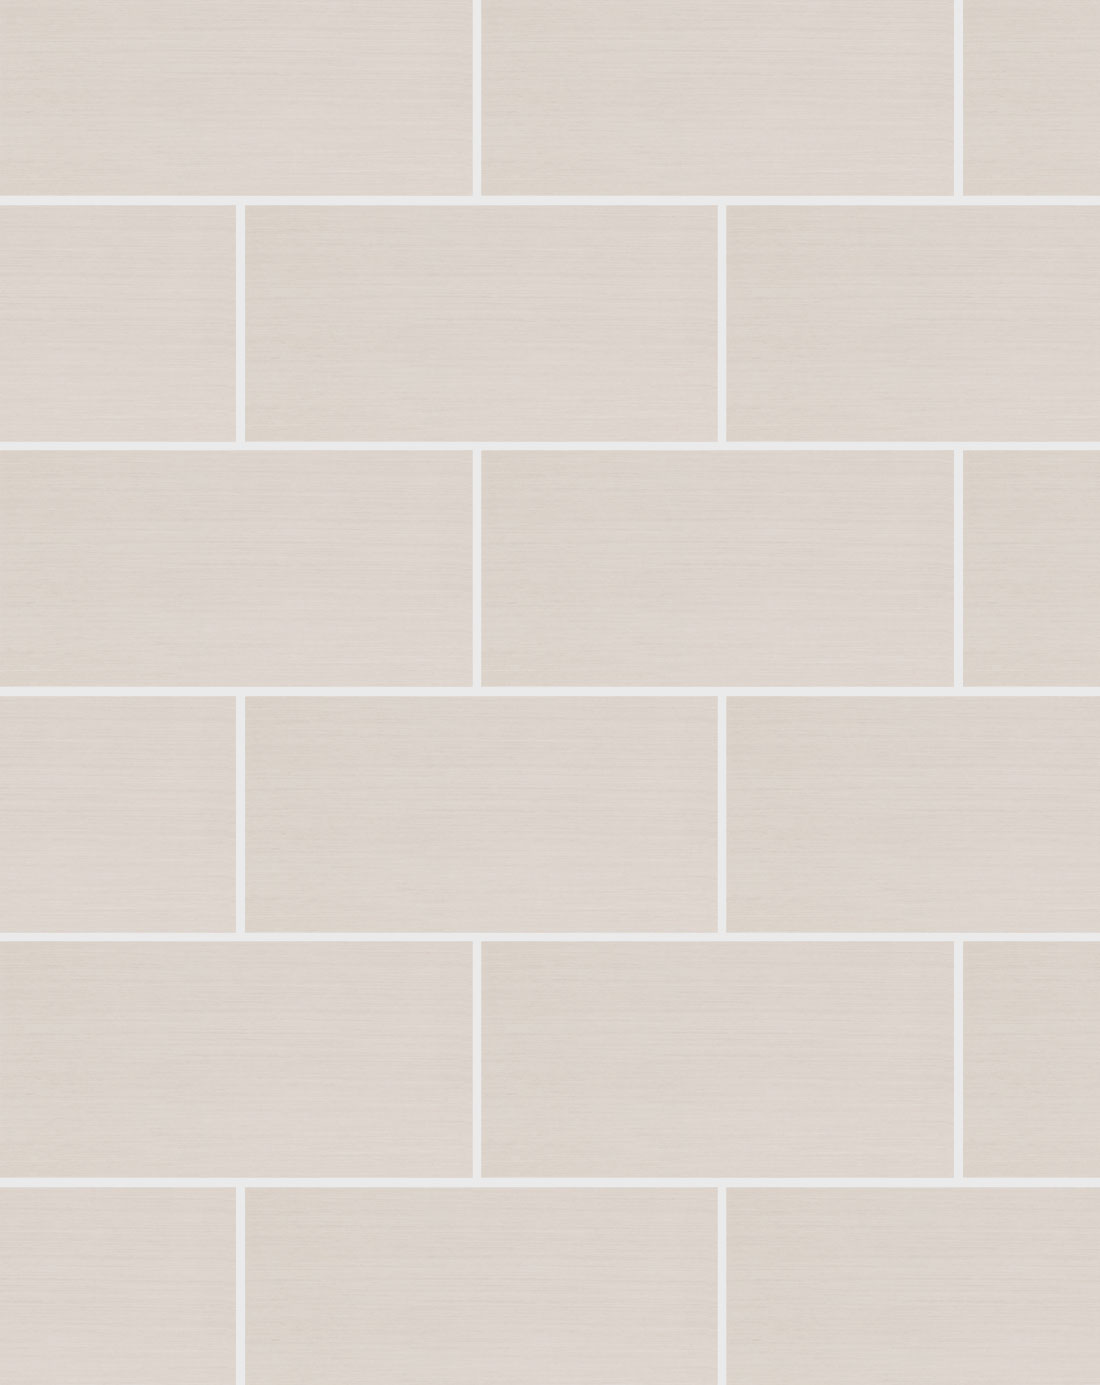 Motive Marfill Wall Tile Bathroom Tiles Direct